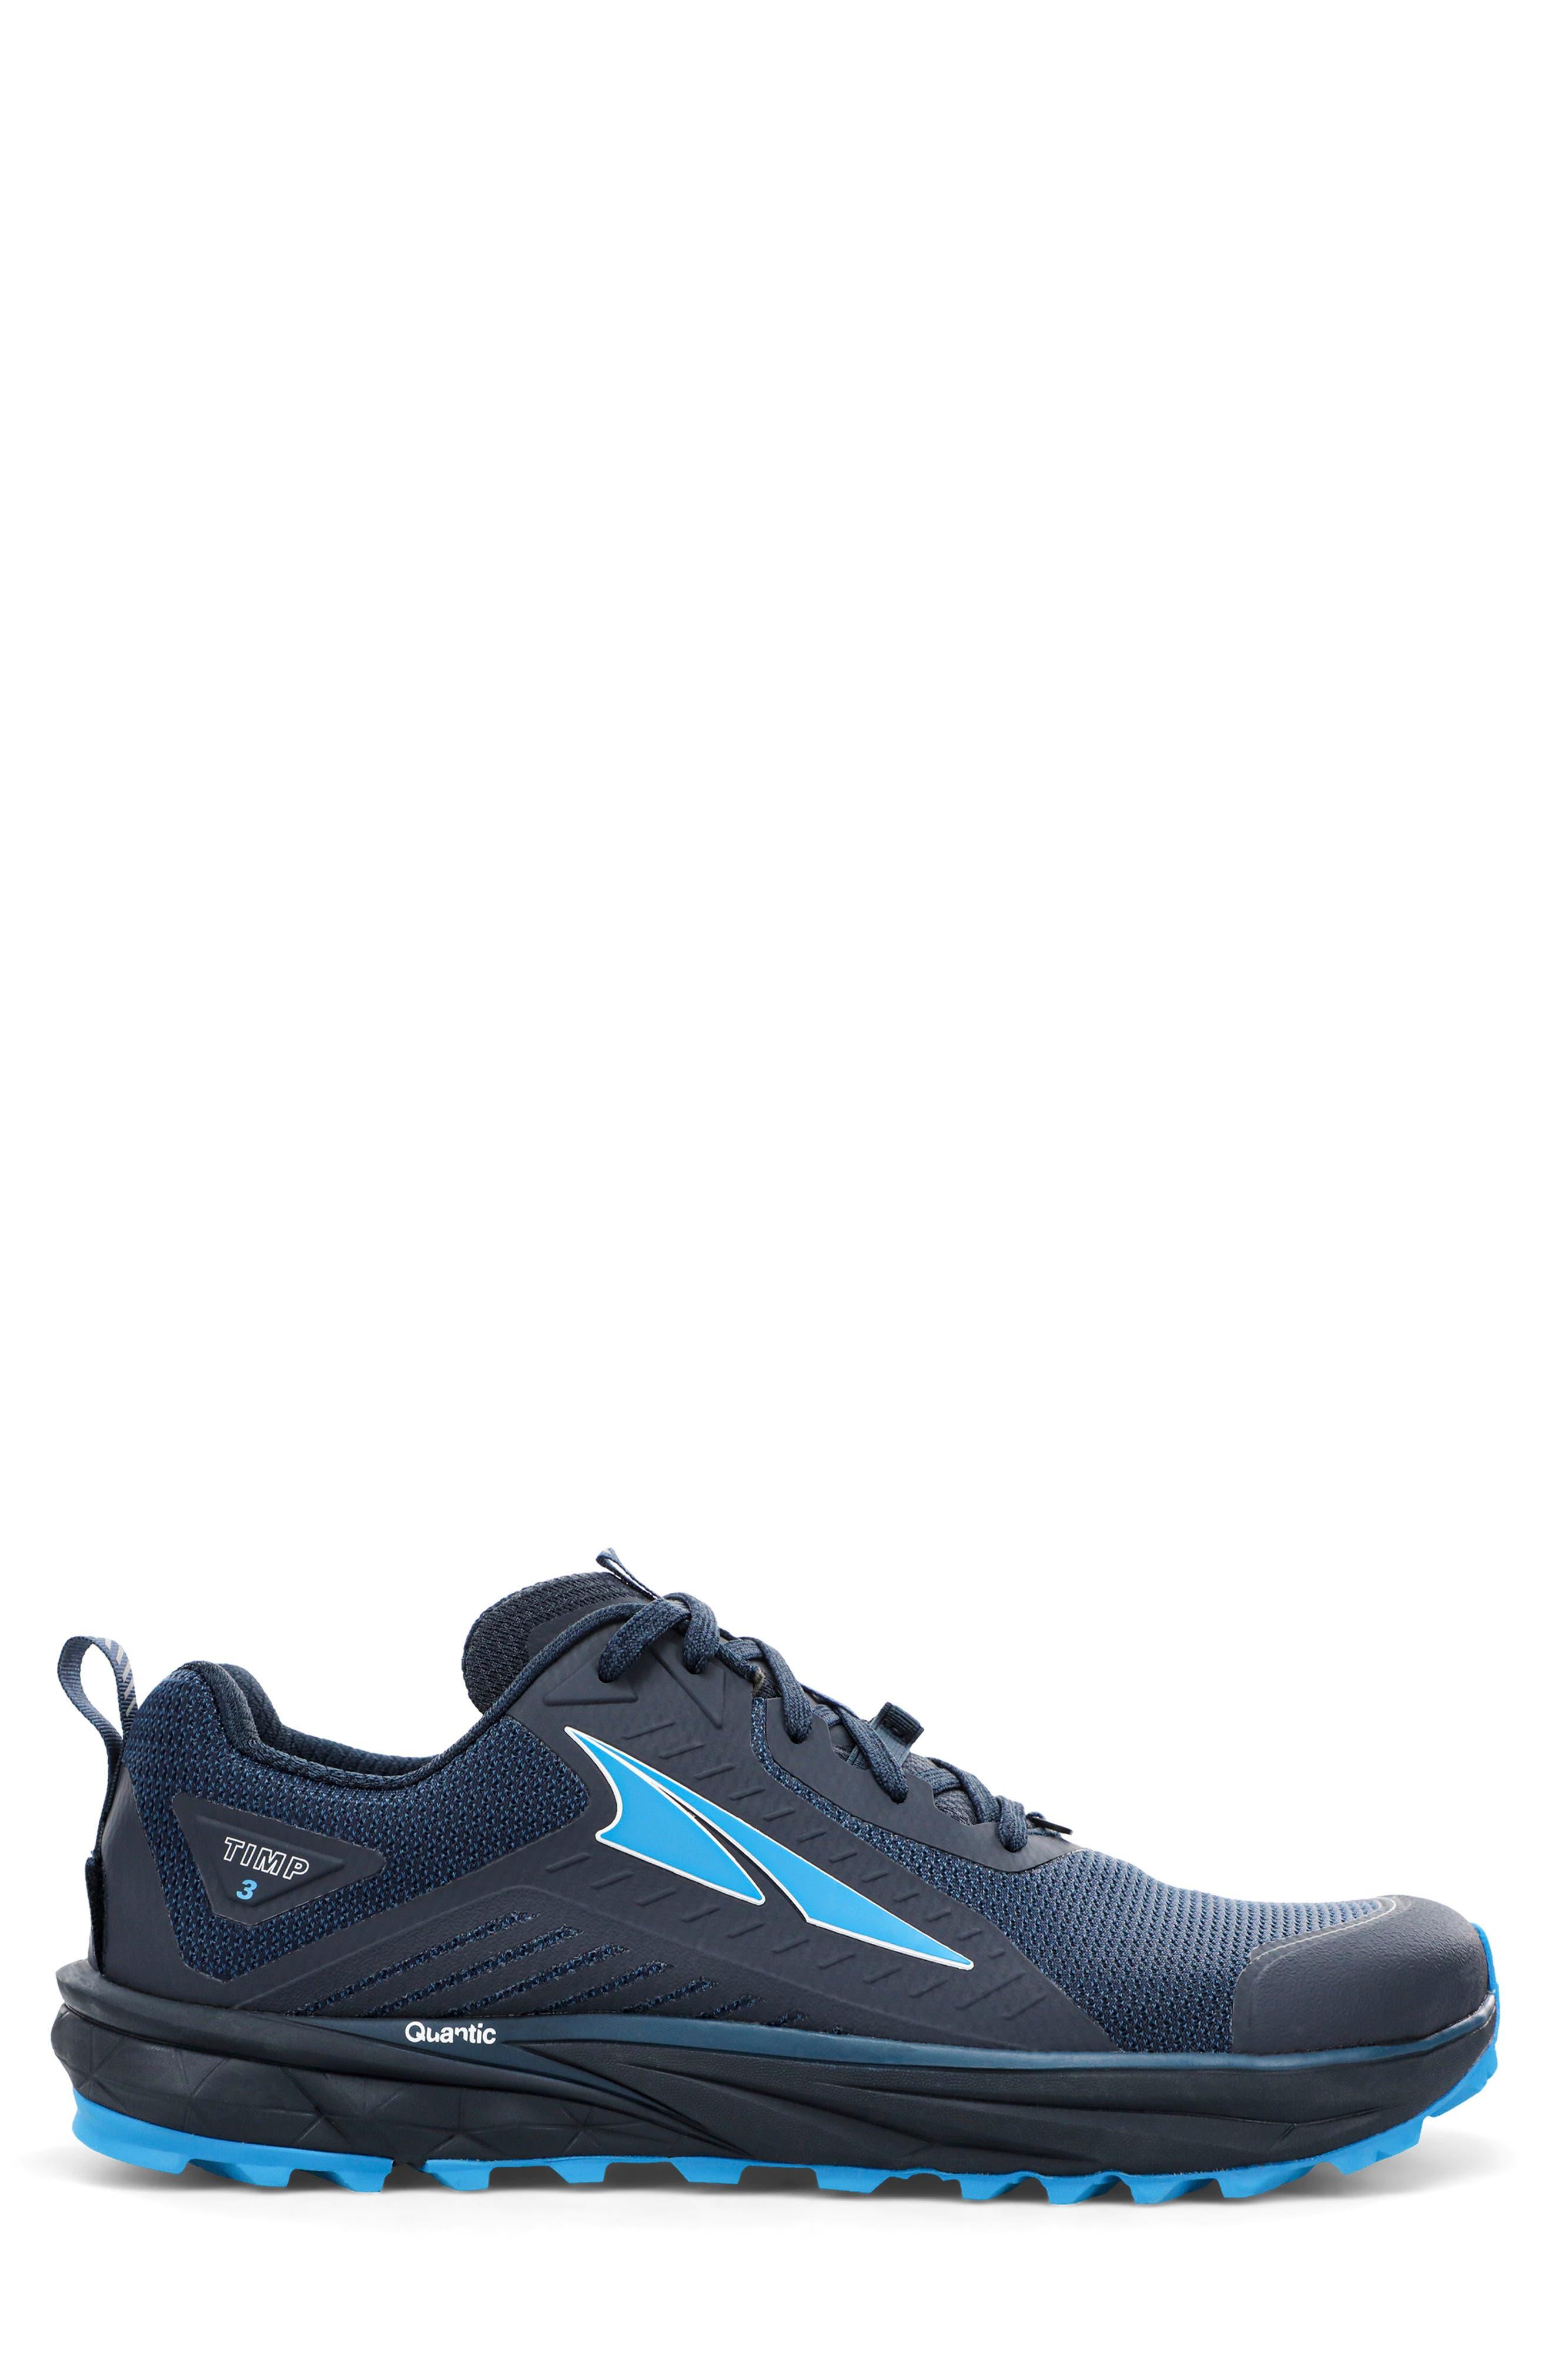 Timp 3 Trail Running Shoe